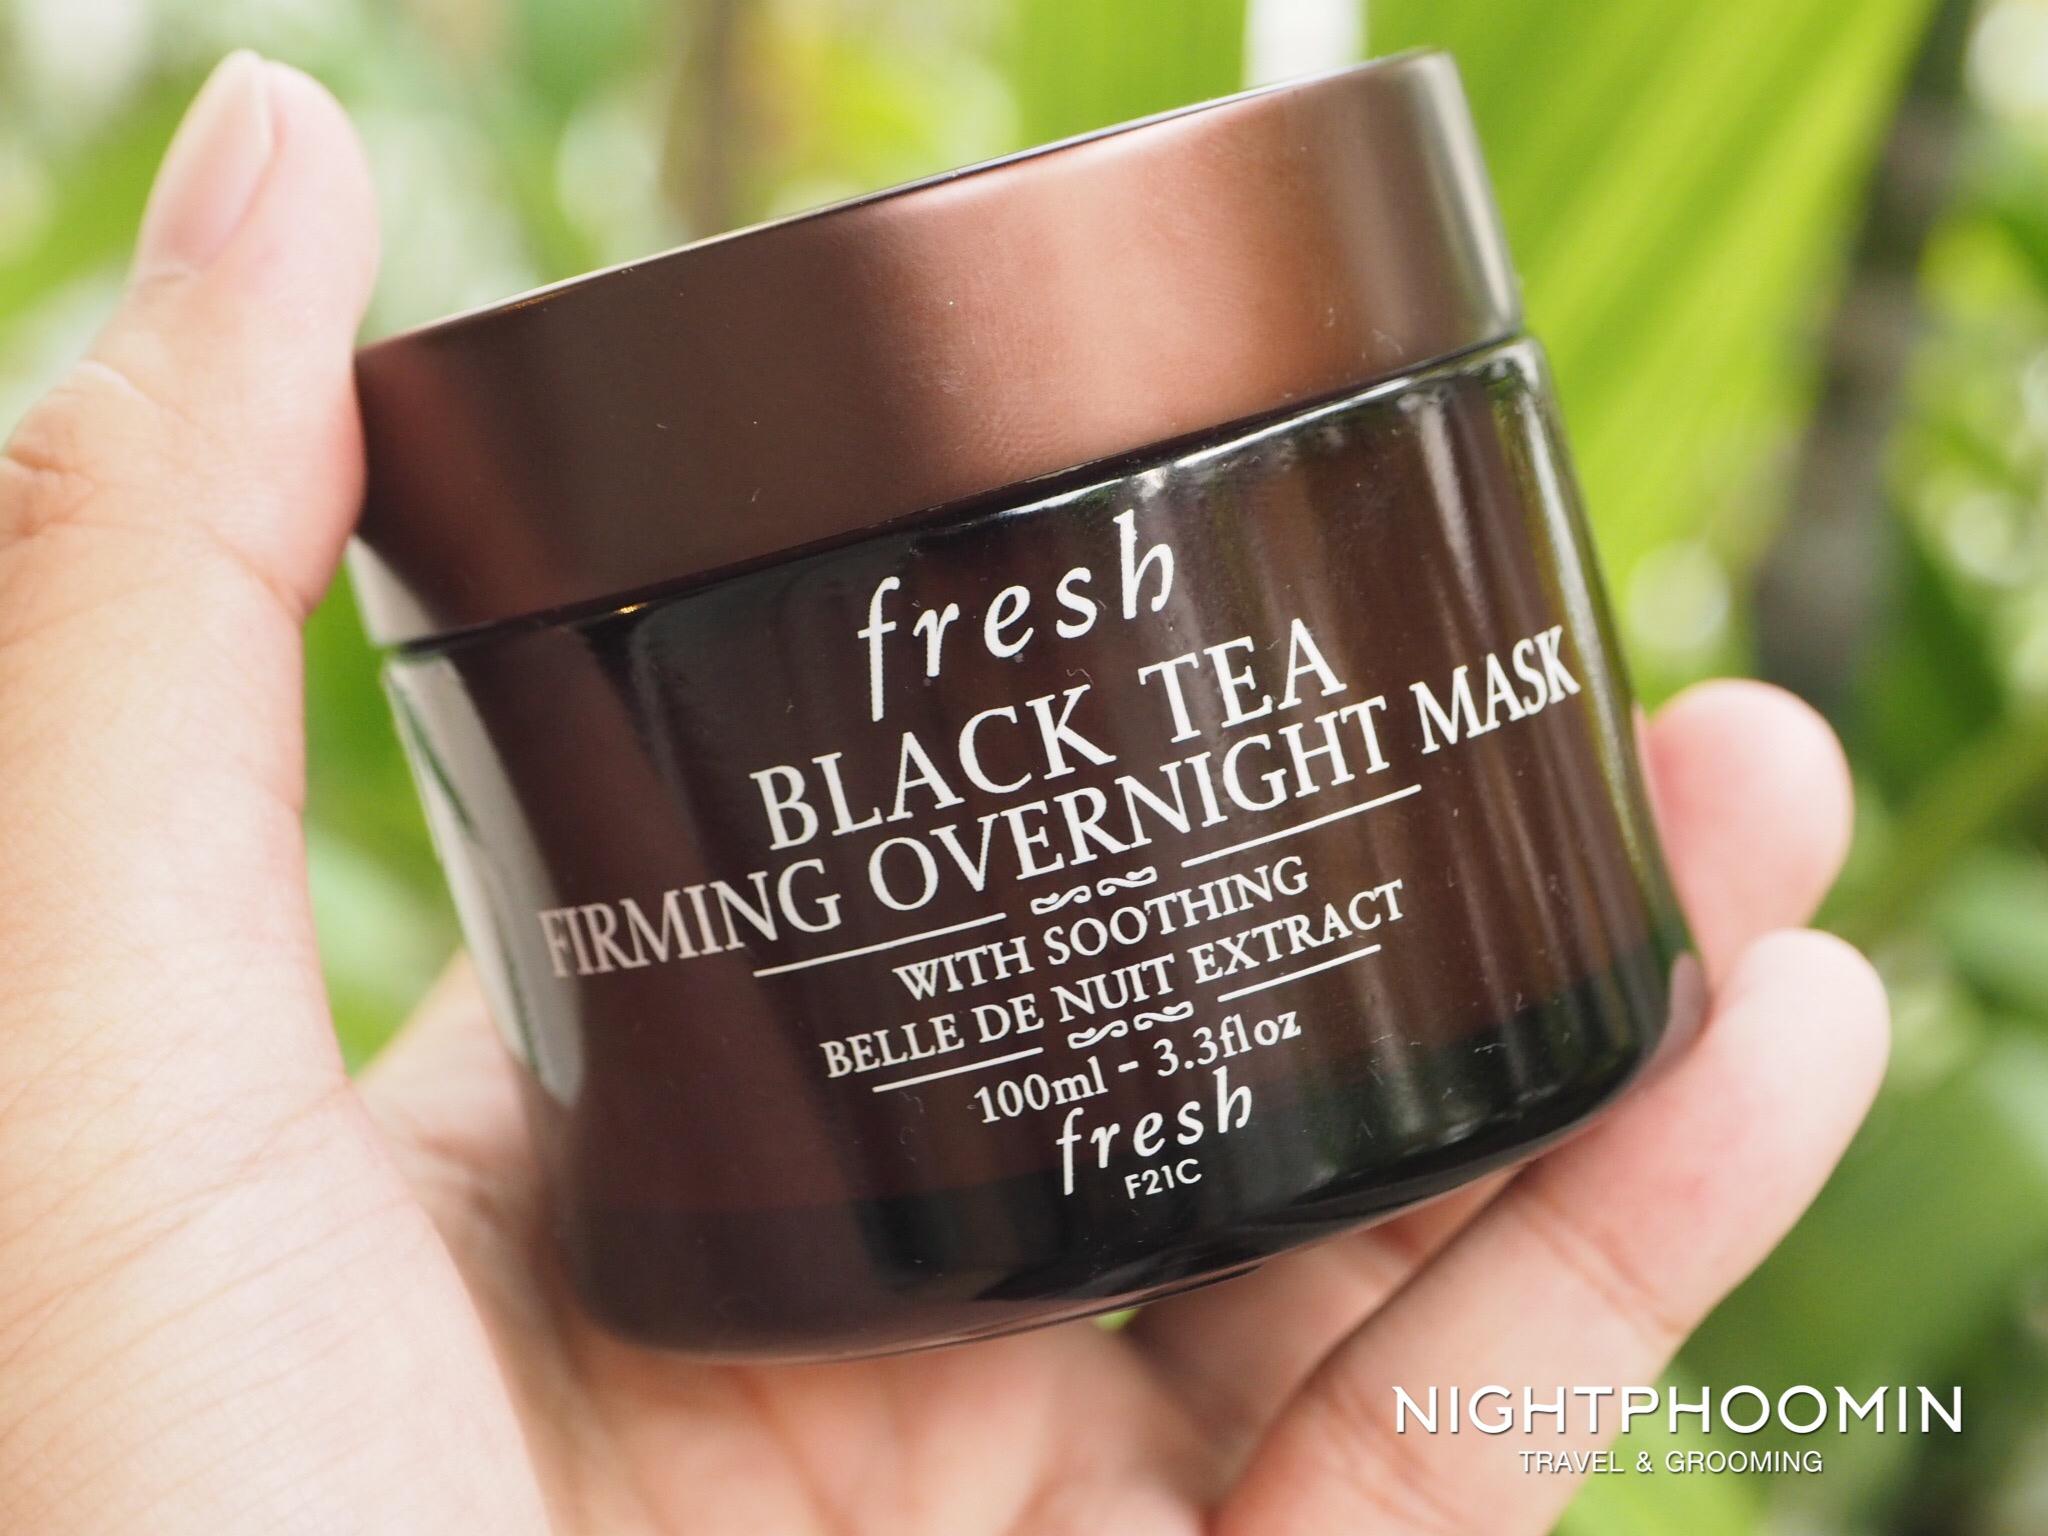 Review Fresh Black Tea Firming Overnight Mask ทากลางค น ต งตอนเช า Nightphoomin Beauty Gym Travel Blogger บล อกเกอร บ วต ออกกำล งกาย ท องเท ยว